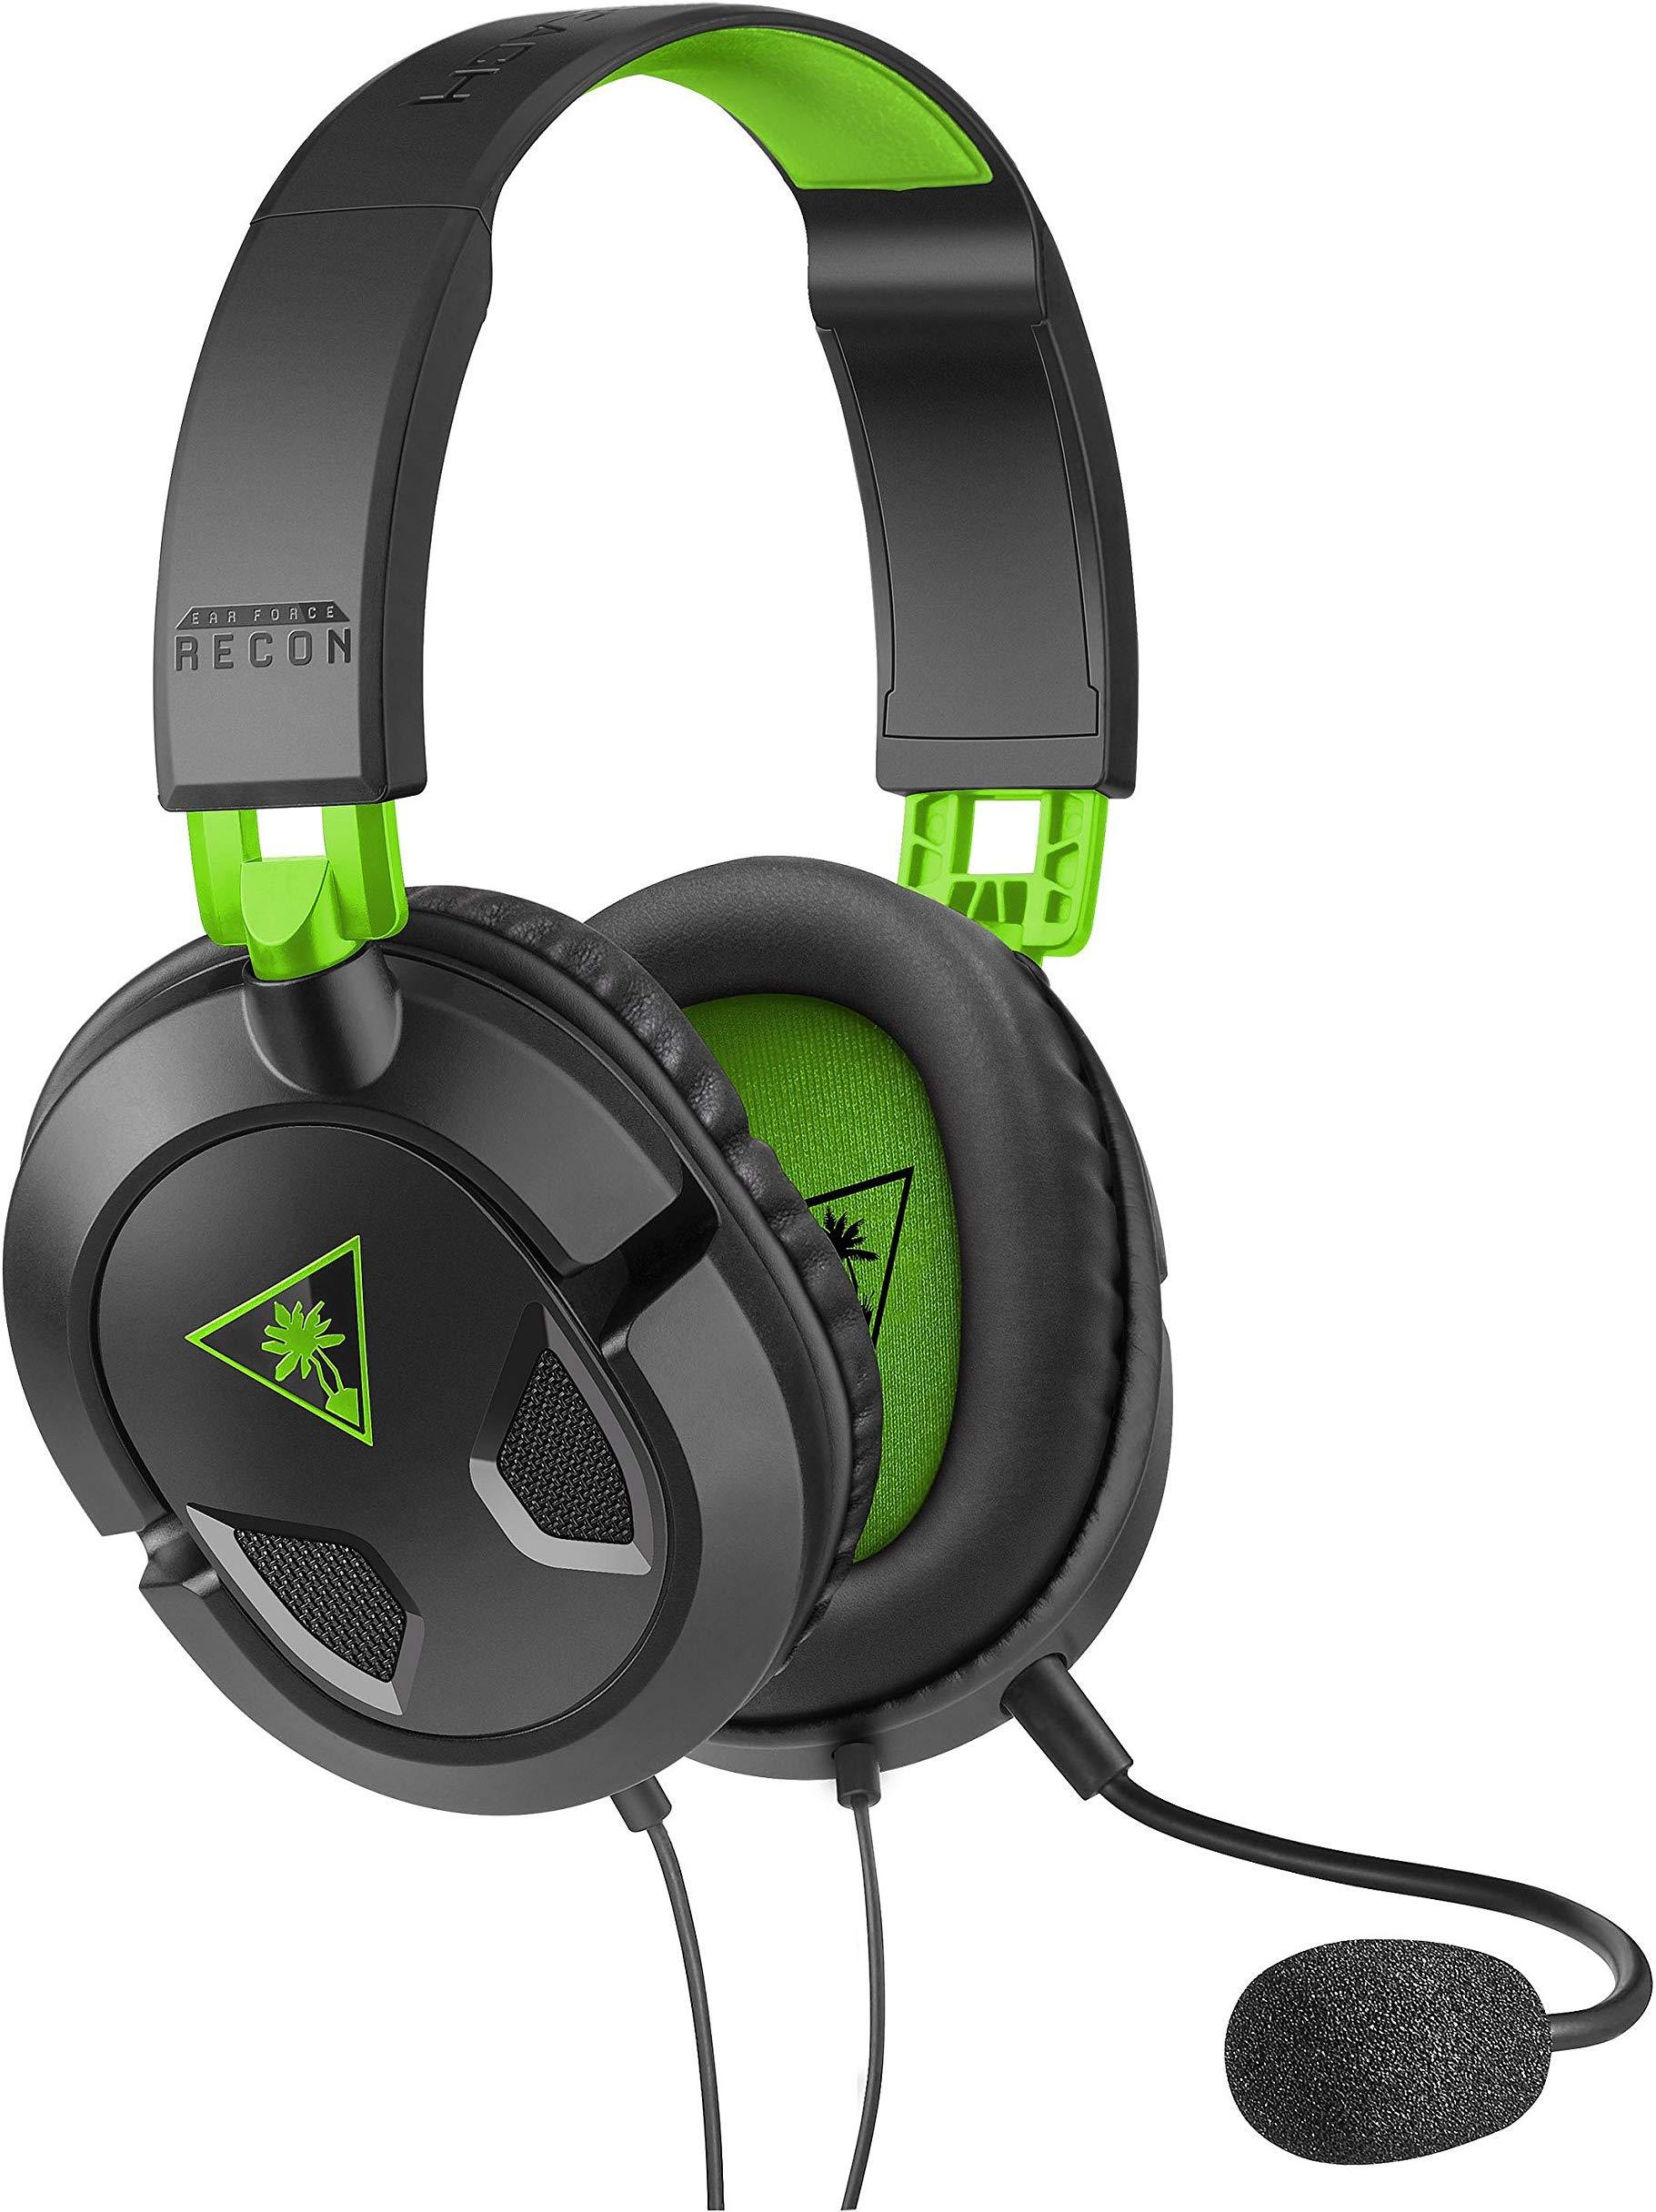 TURTLE BEACH RECON 50X best gaming headphones